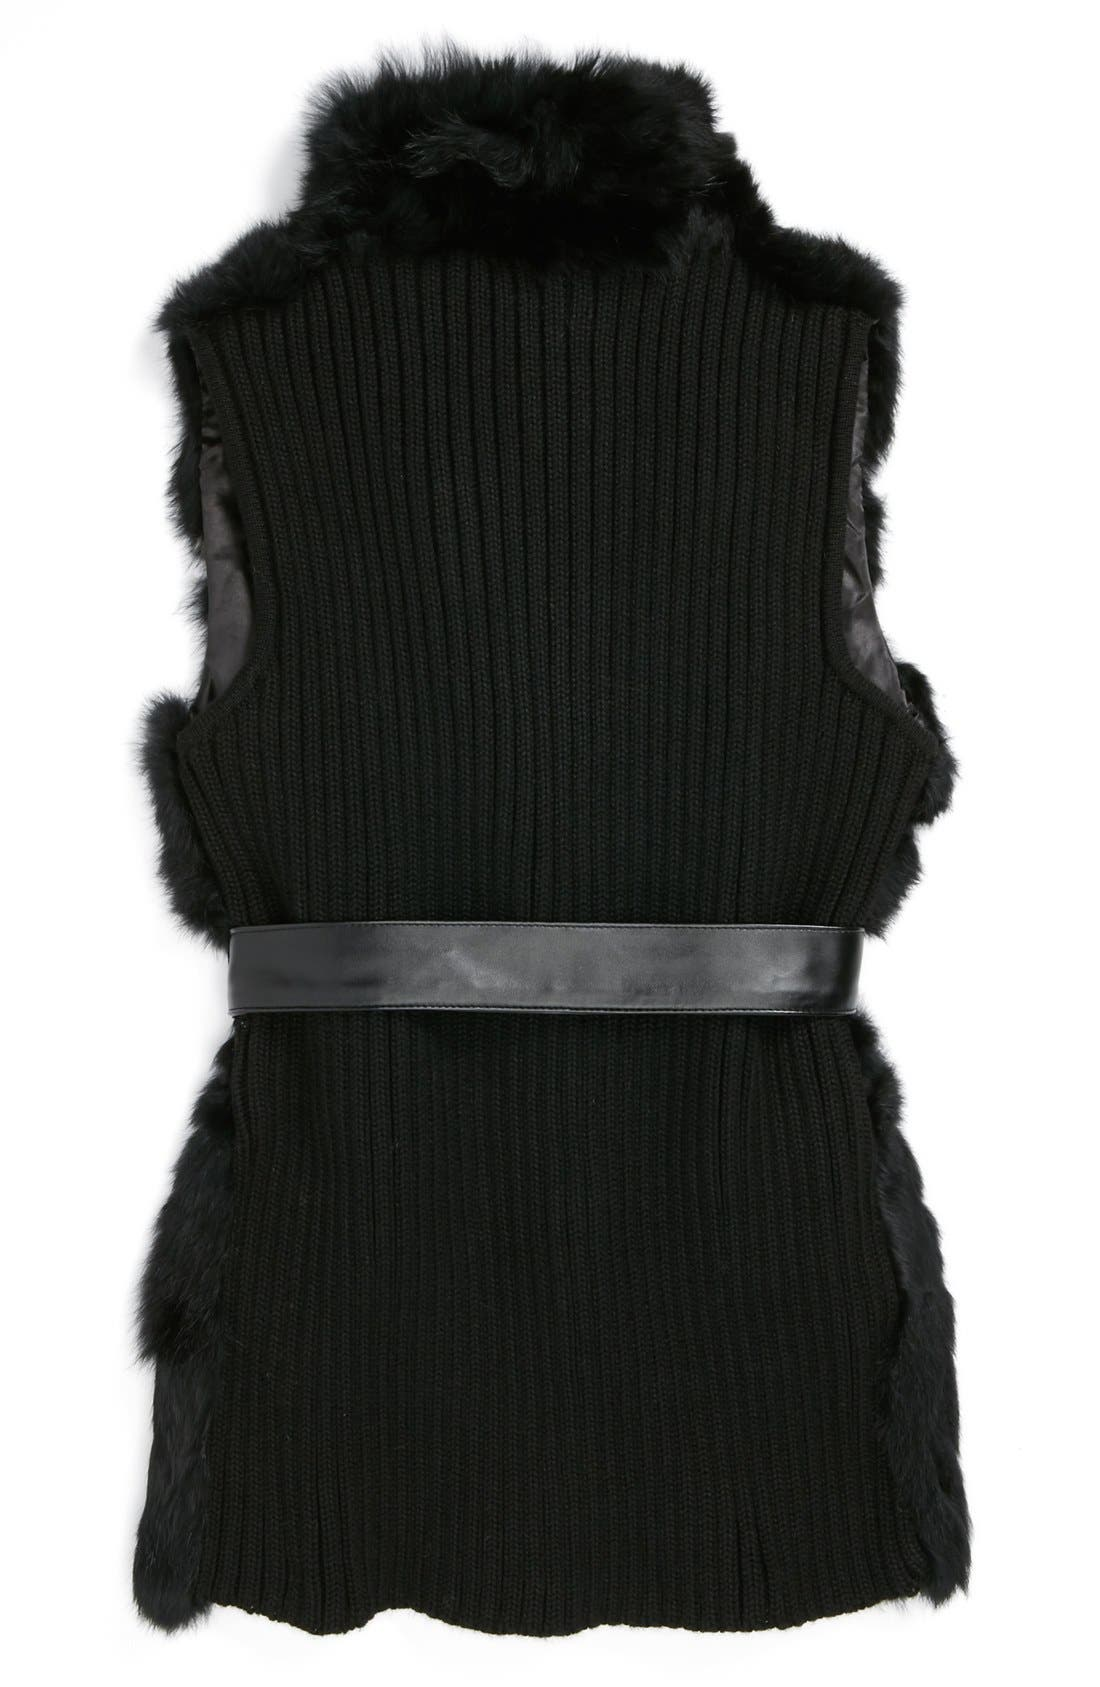 LA FIORENTINA,                             Genuine Rabbit Fur Vest,                             Alternate thumbnail 2, color,                             001